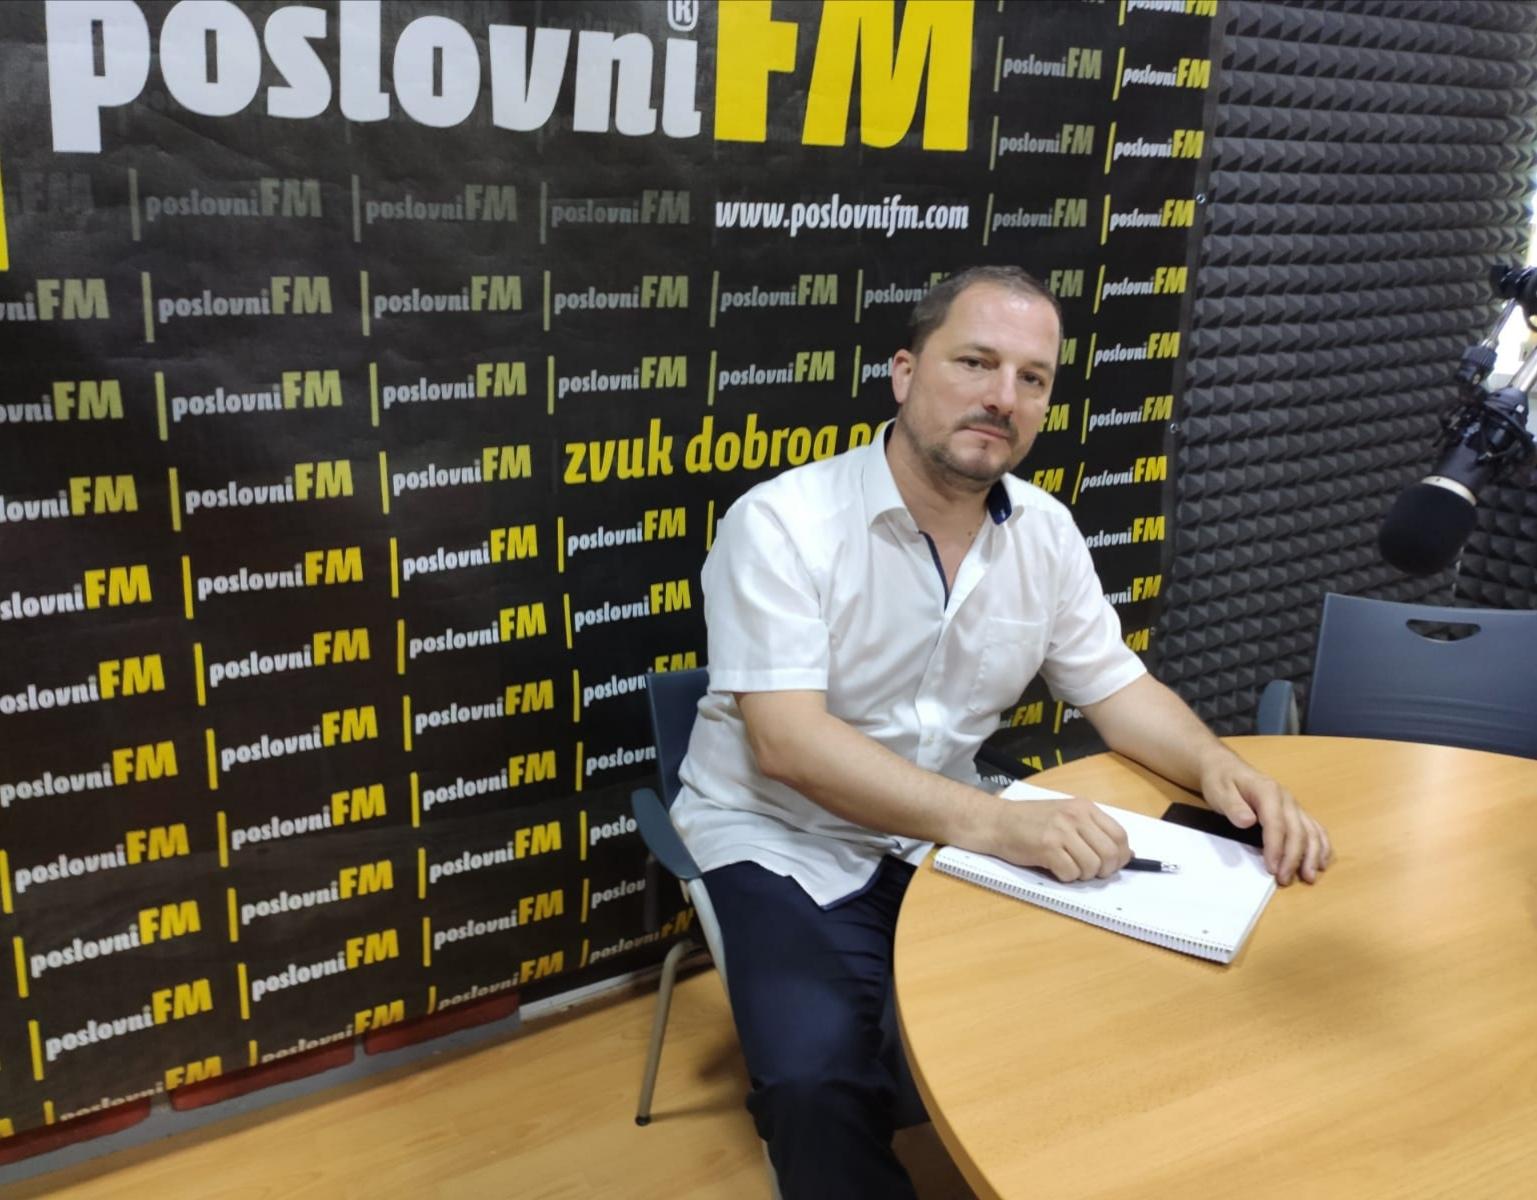 Hrvoje serdarusic